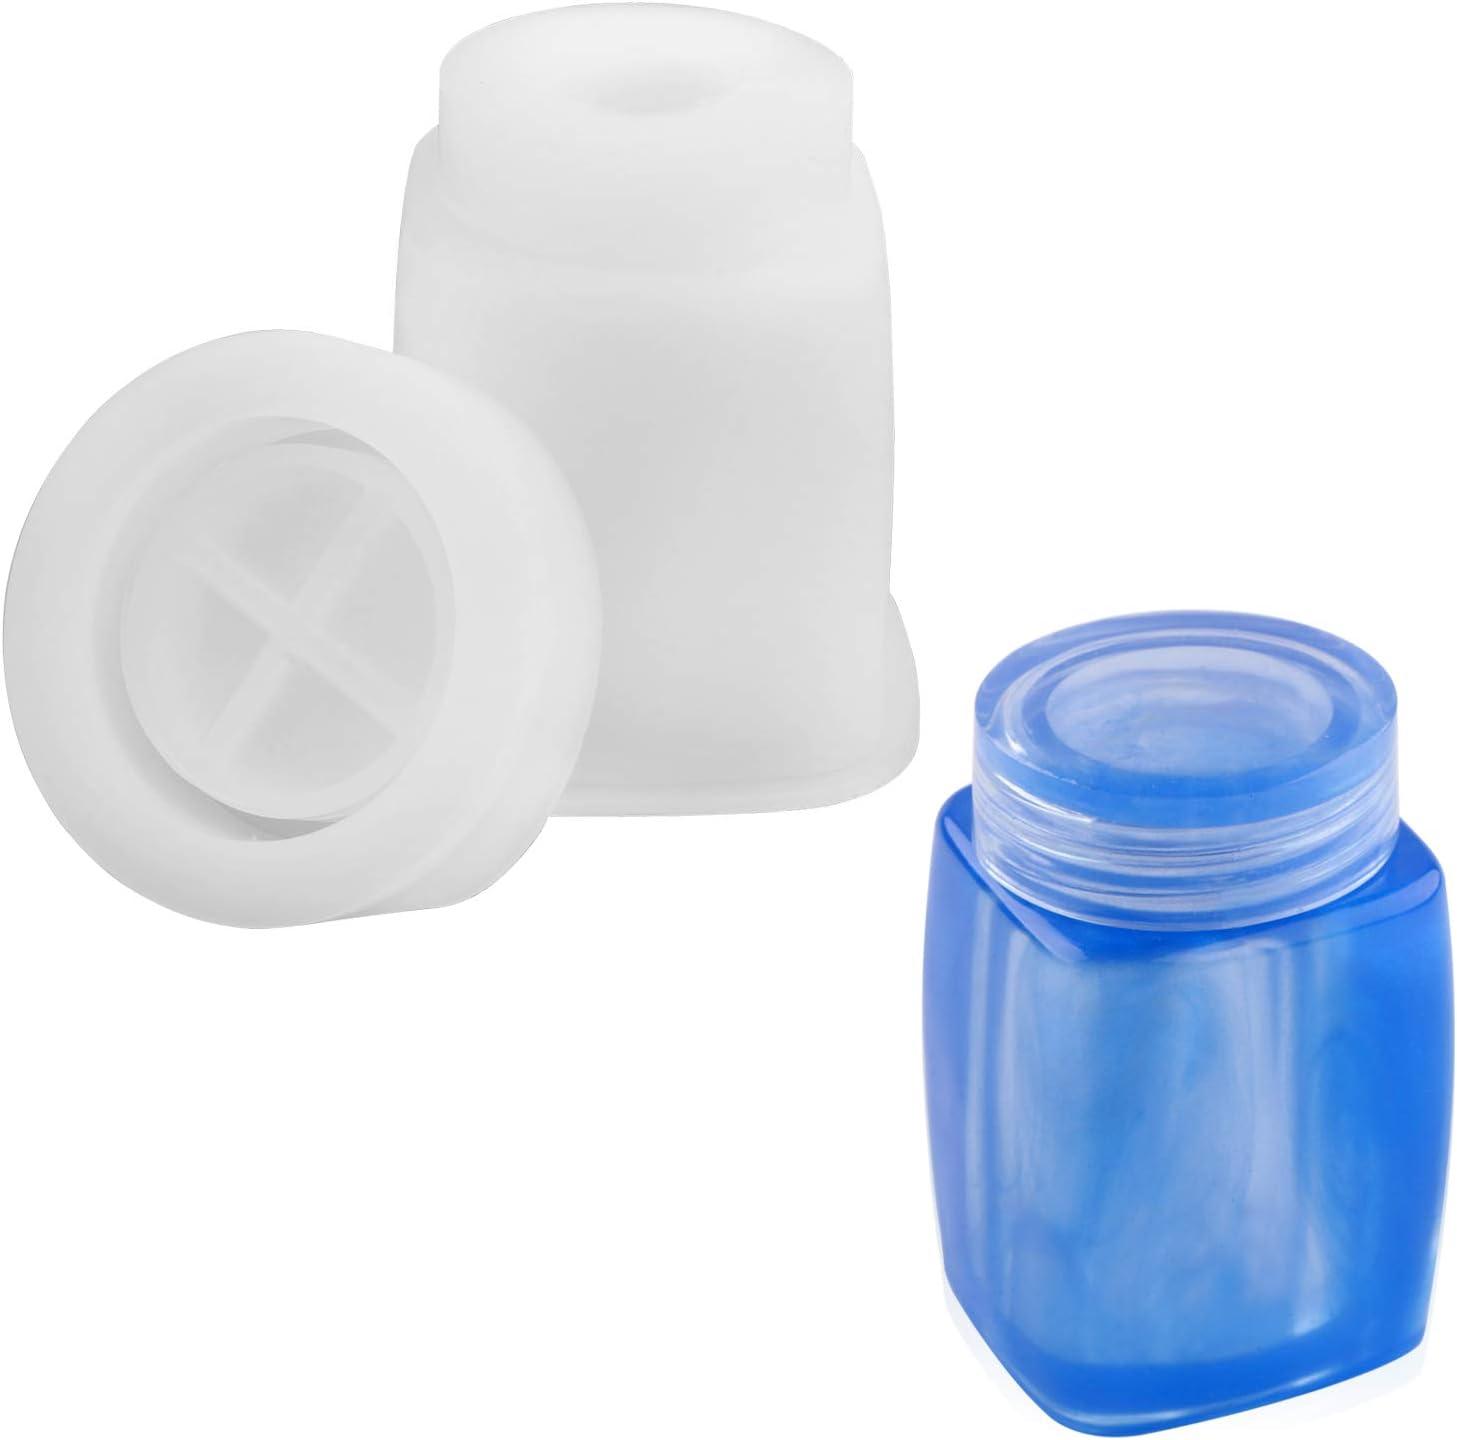 Box Resin Matrix with Lid Max 51% OFF Max 87% OFF Bottle Storage Matr